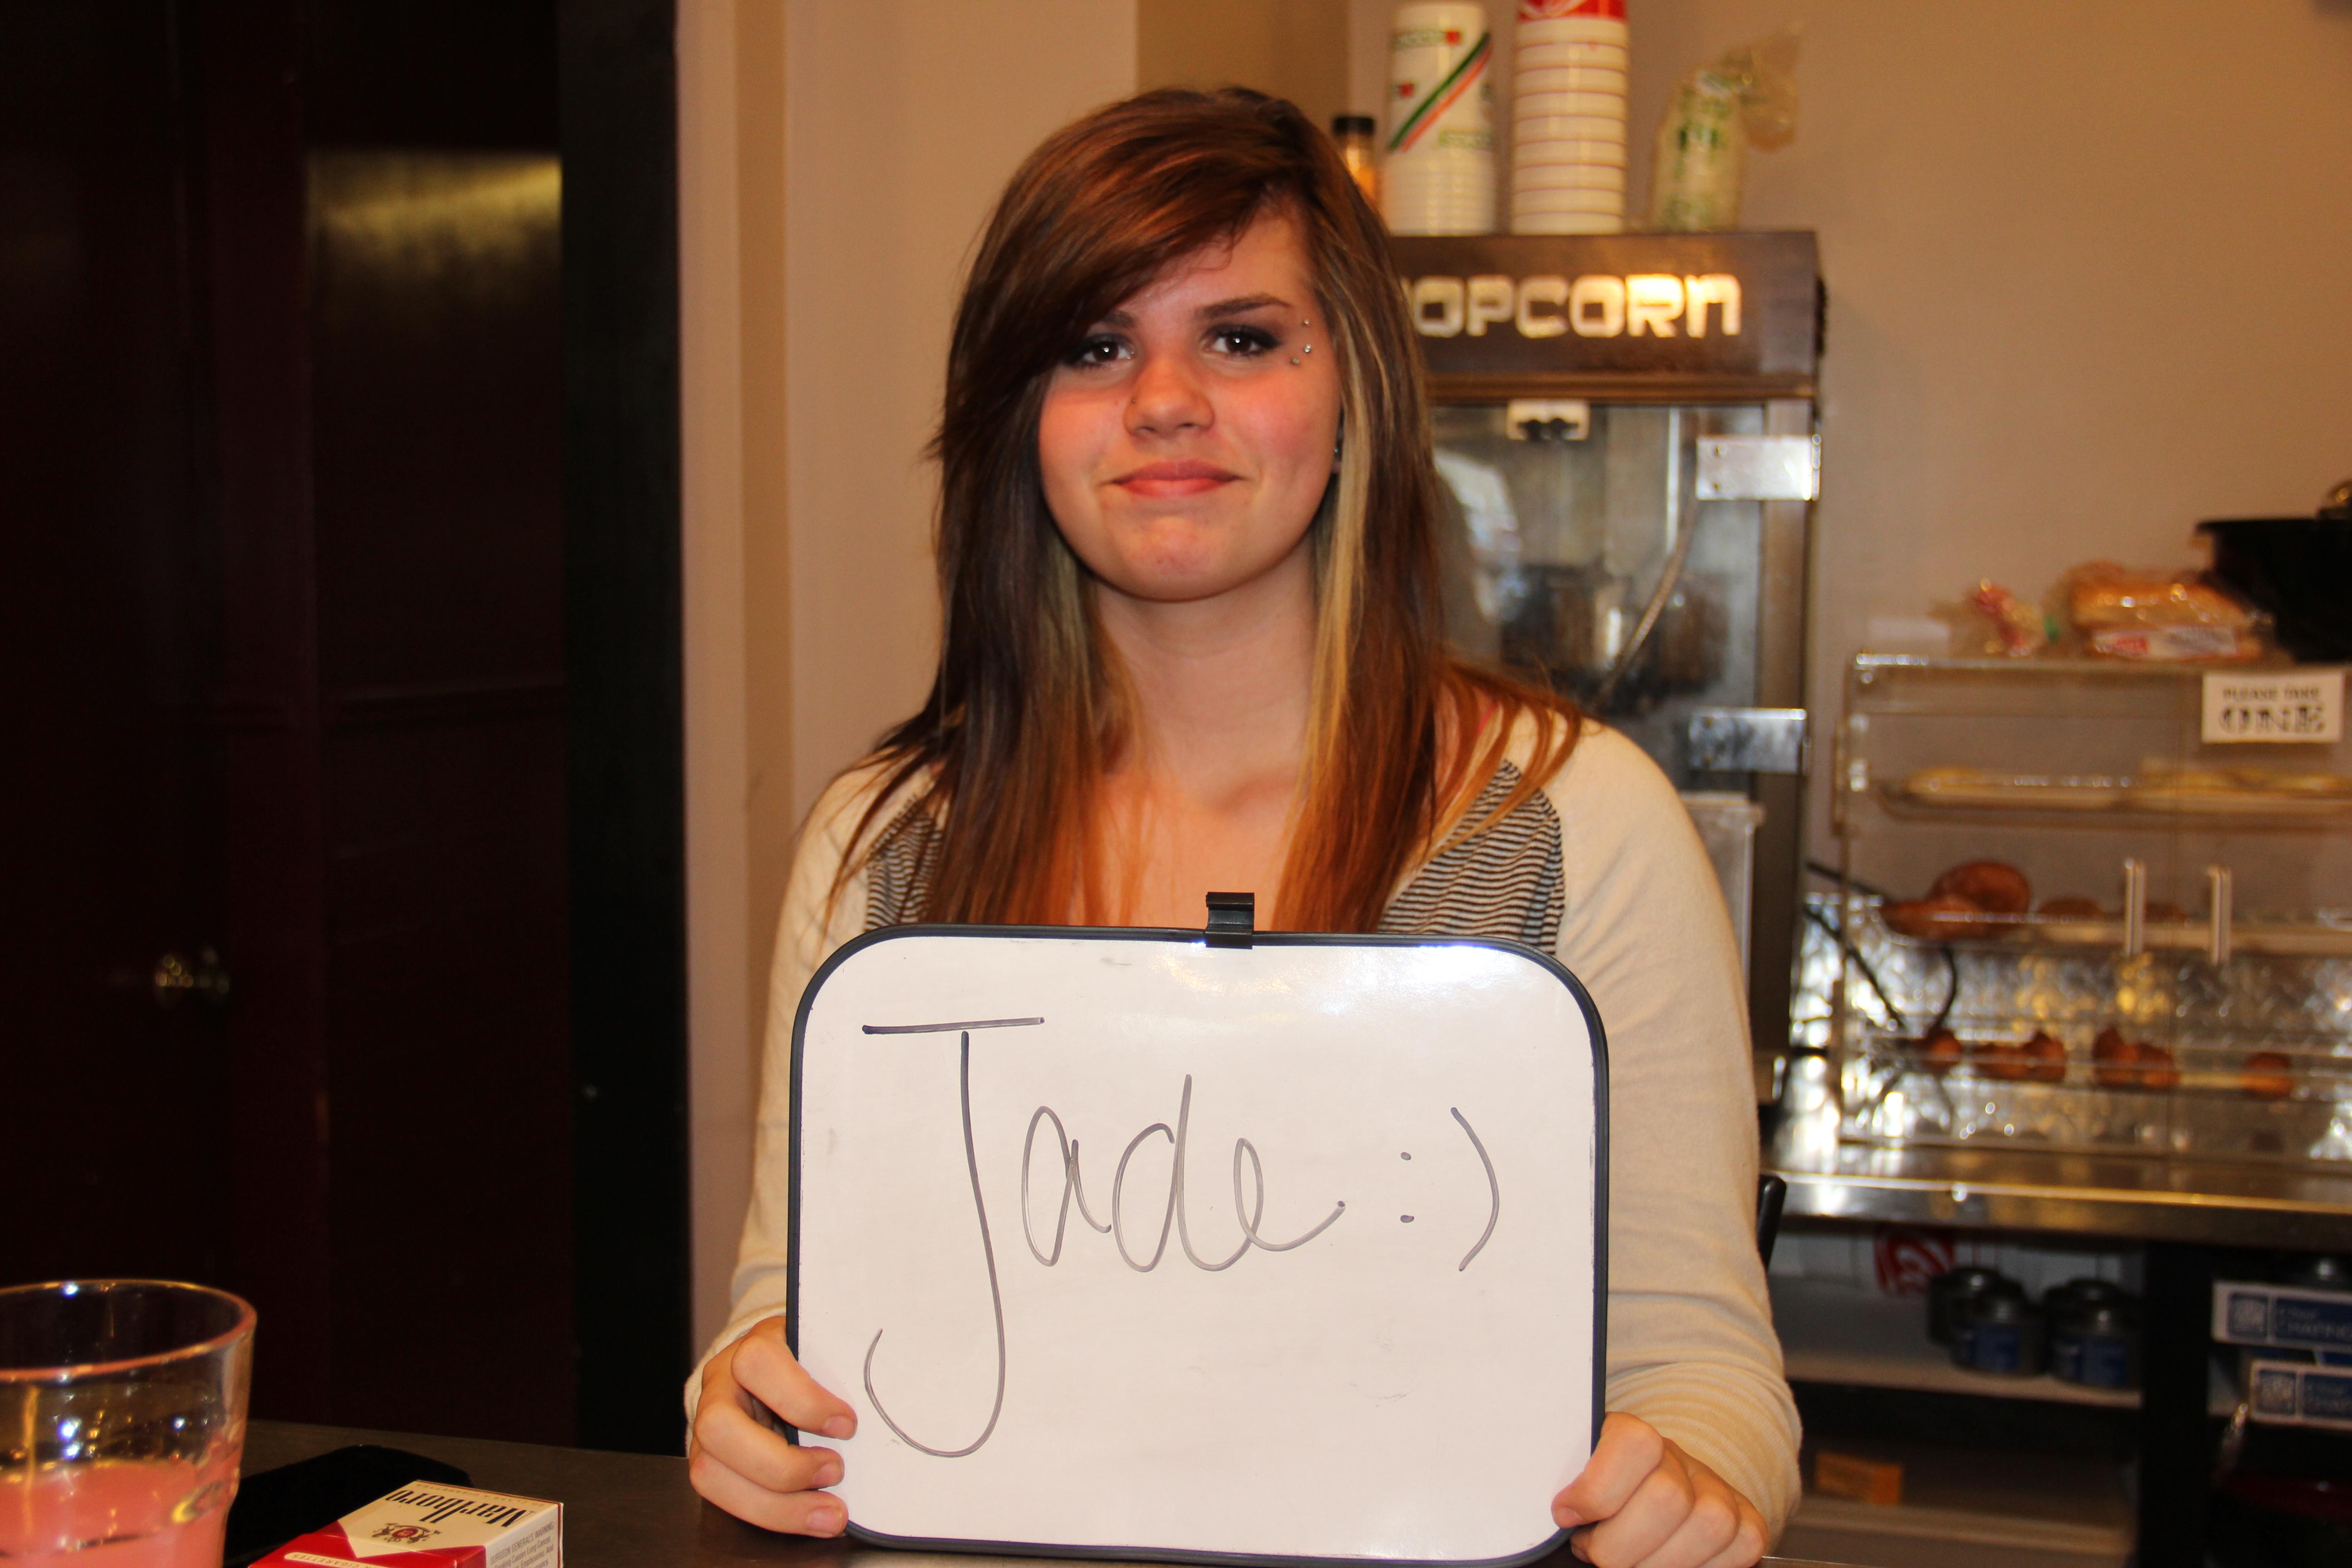 Jade-001.JPG